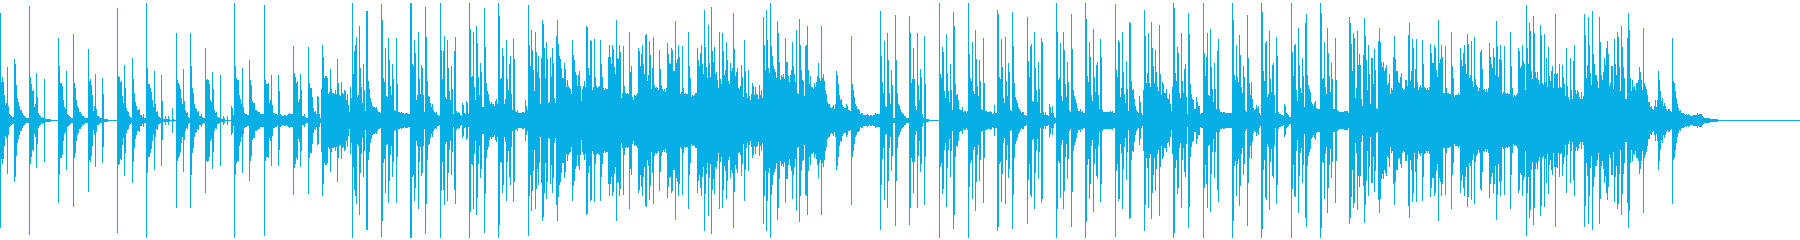 CM・ジングル・無機質&ポップスの再生済みの波形